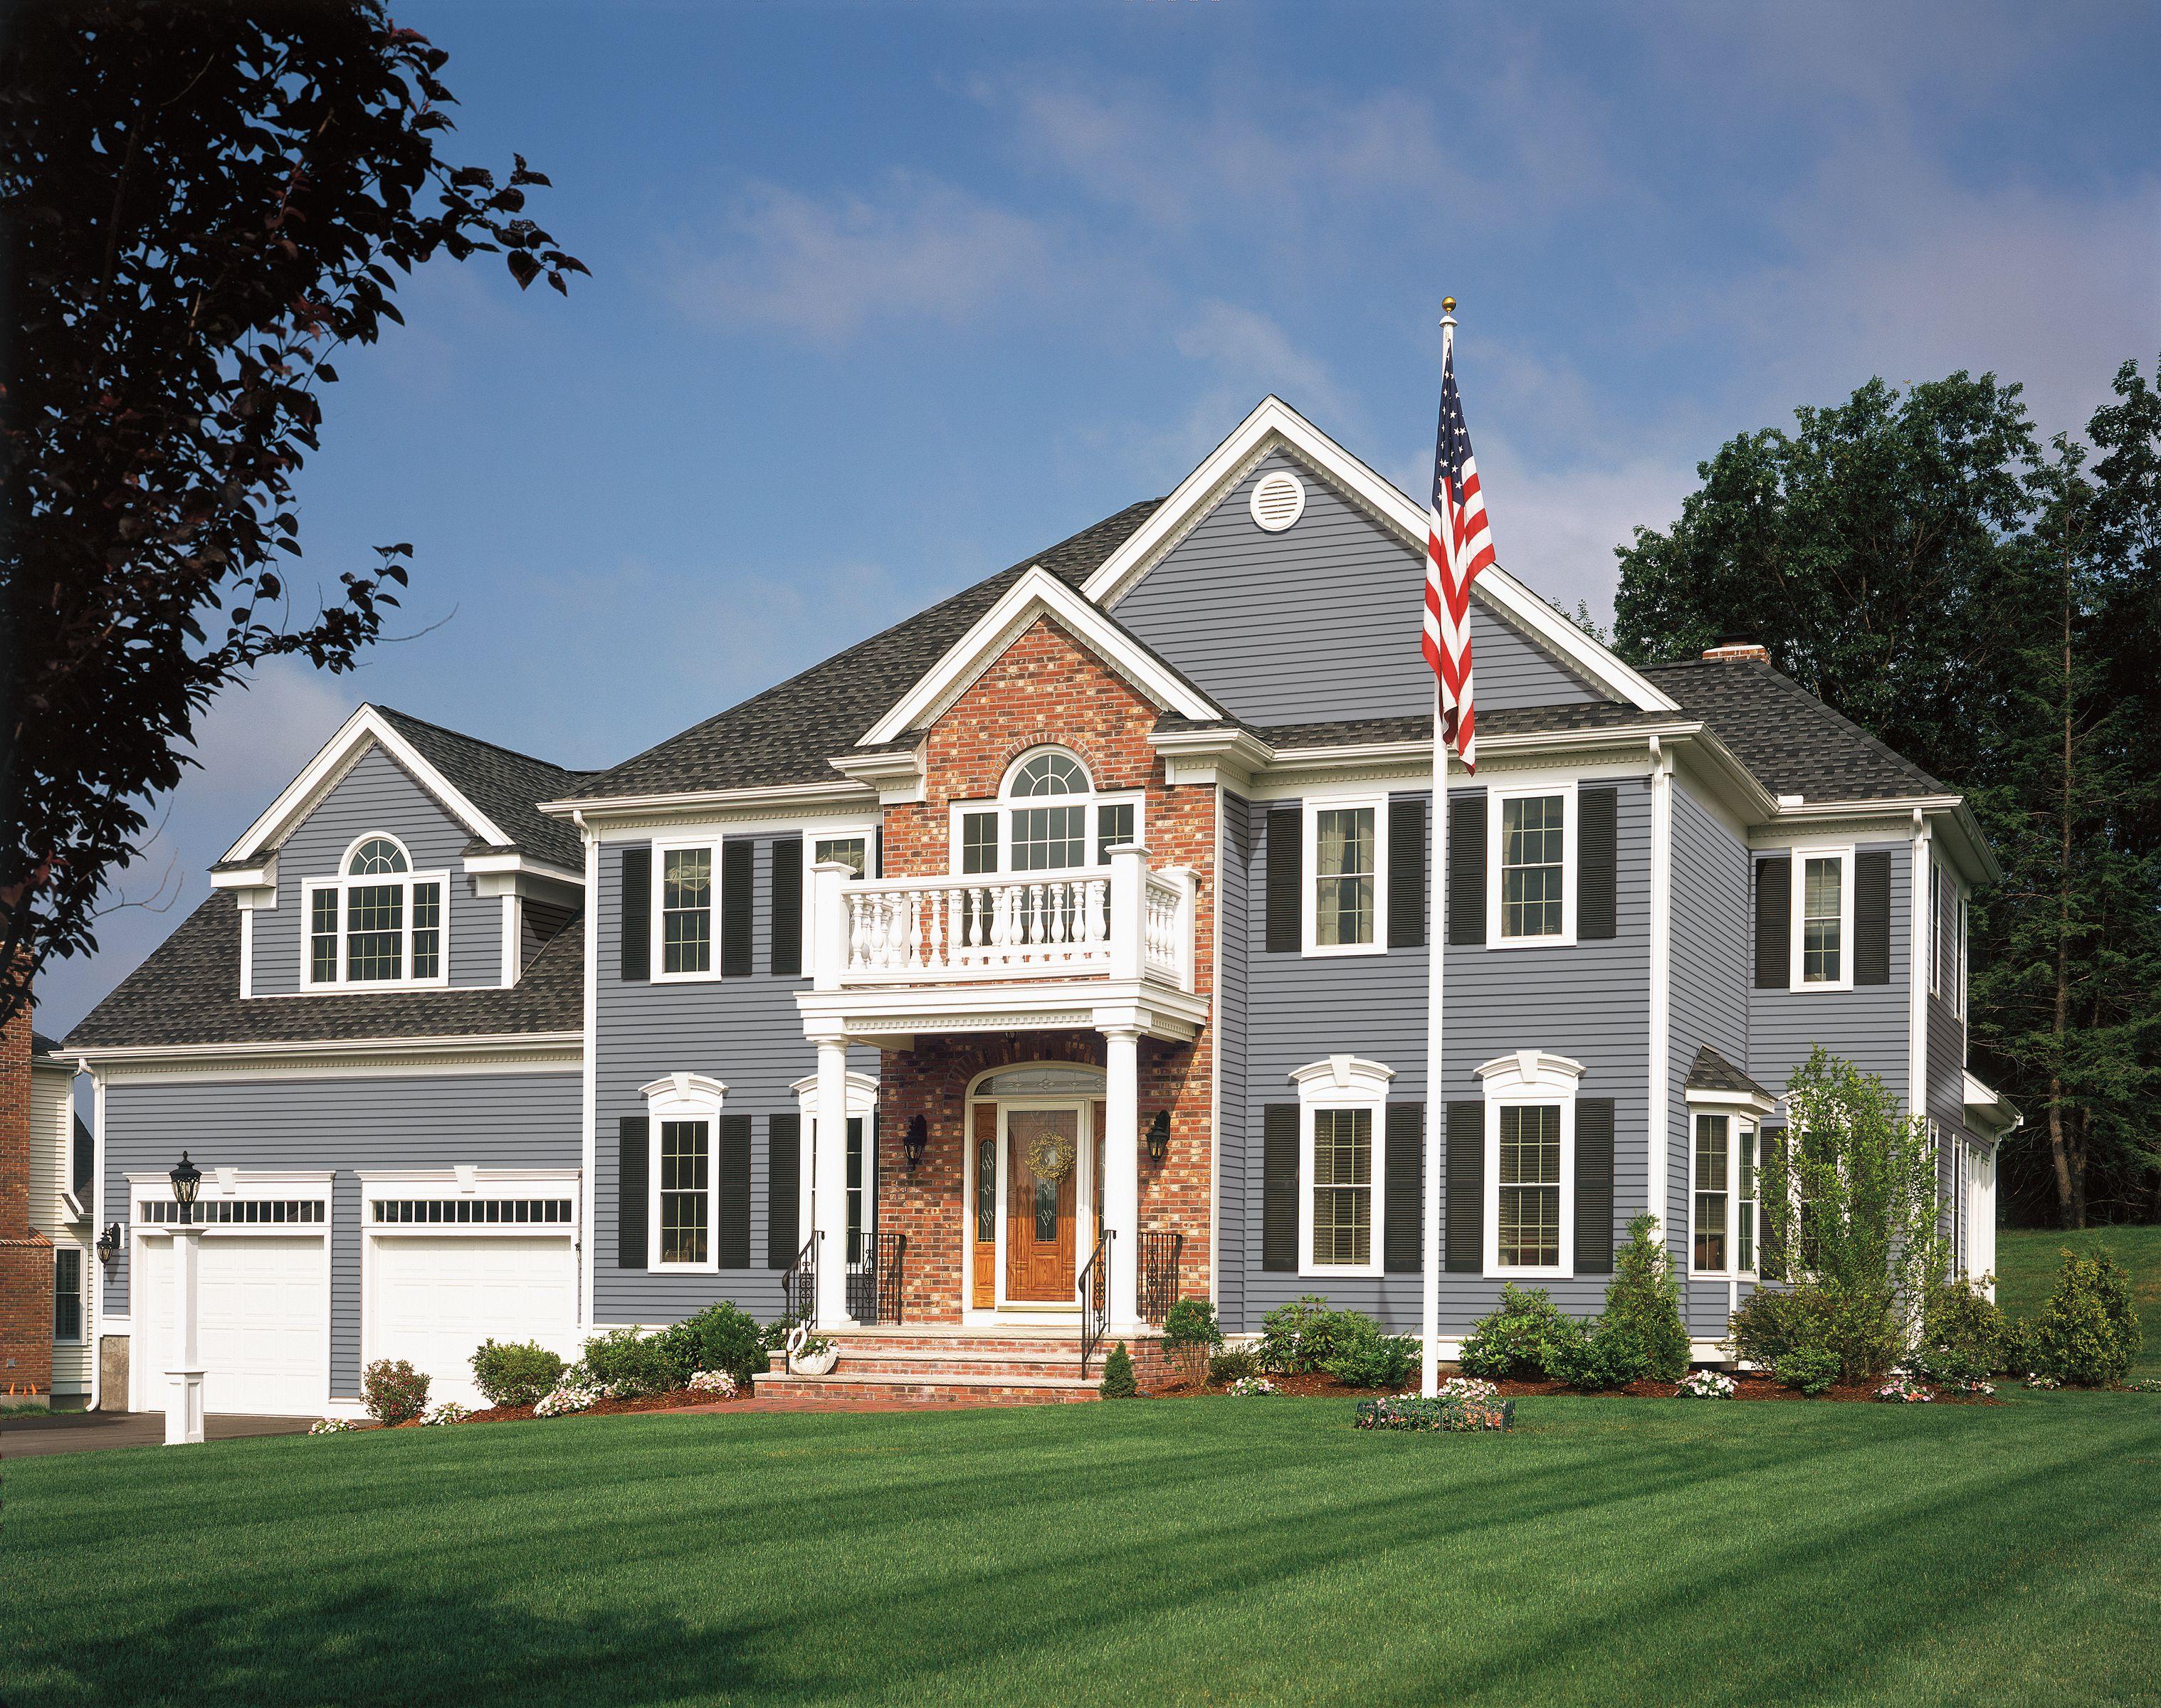 Certainteed Siding Monogram Flagstone Siding Colors For Houses House Siding Blue Siding